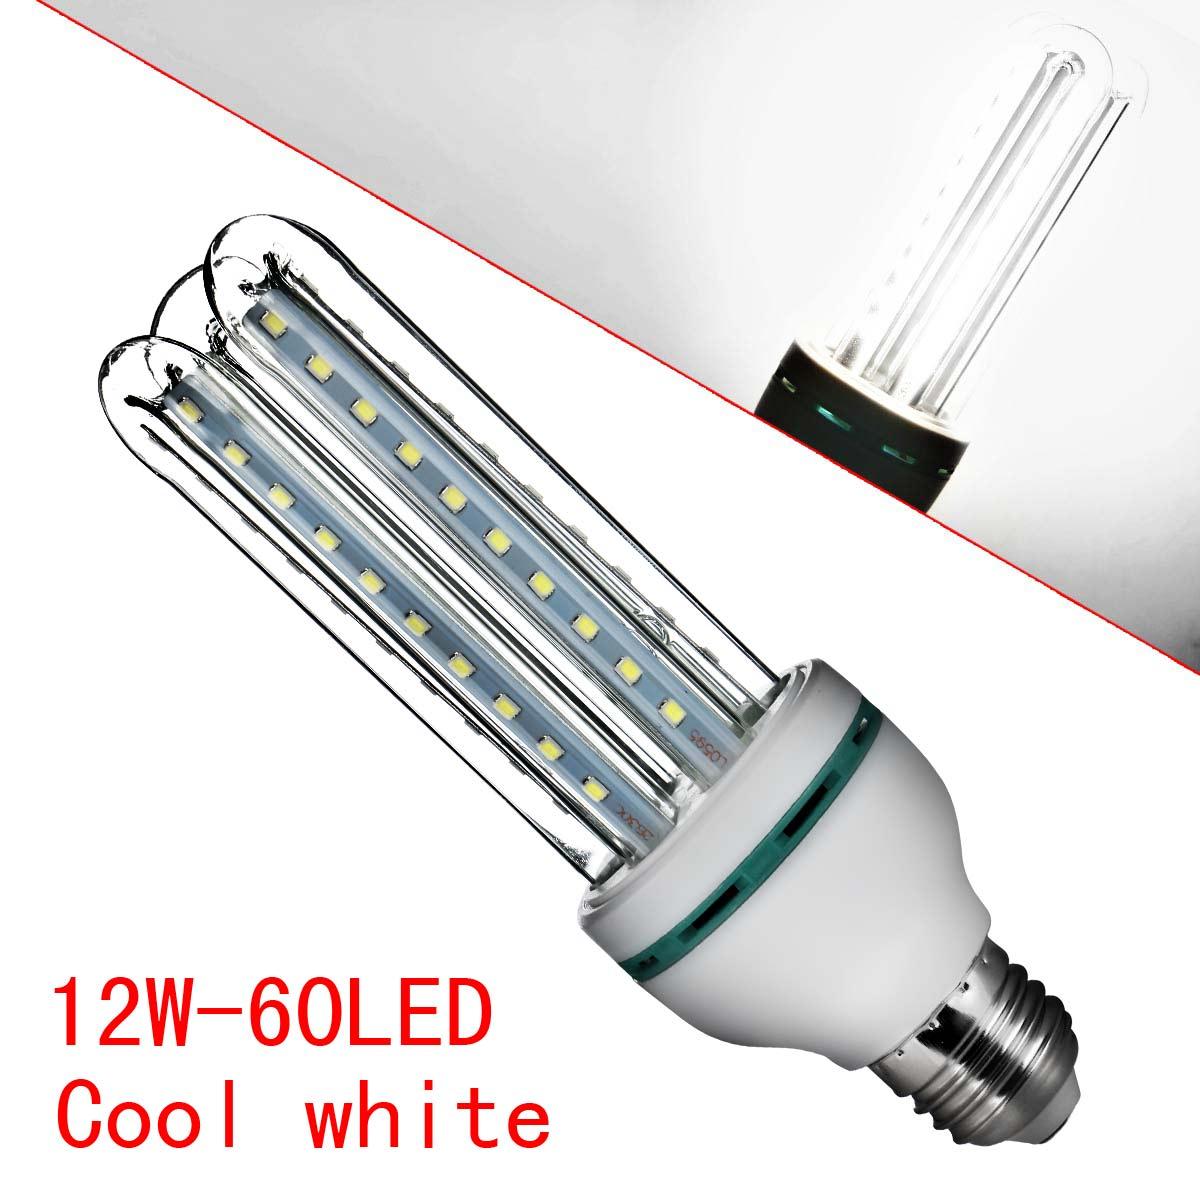 E27 Smd 2835 Led Corn Bulb Chip U Type Energy Saving Light Candle Globe Lamp